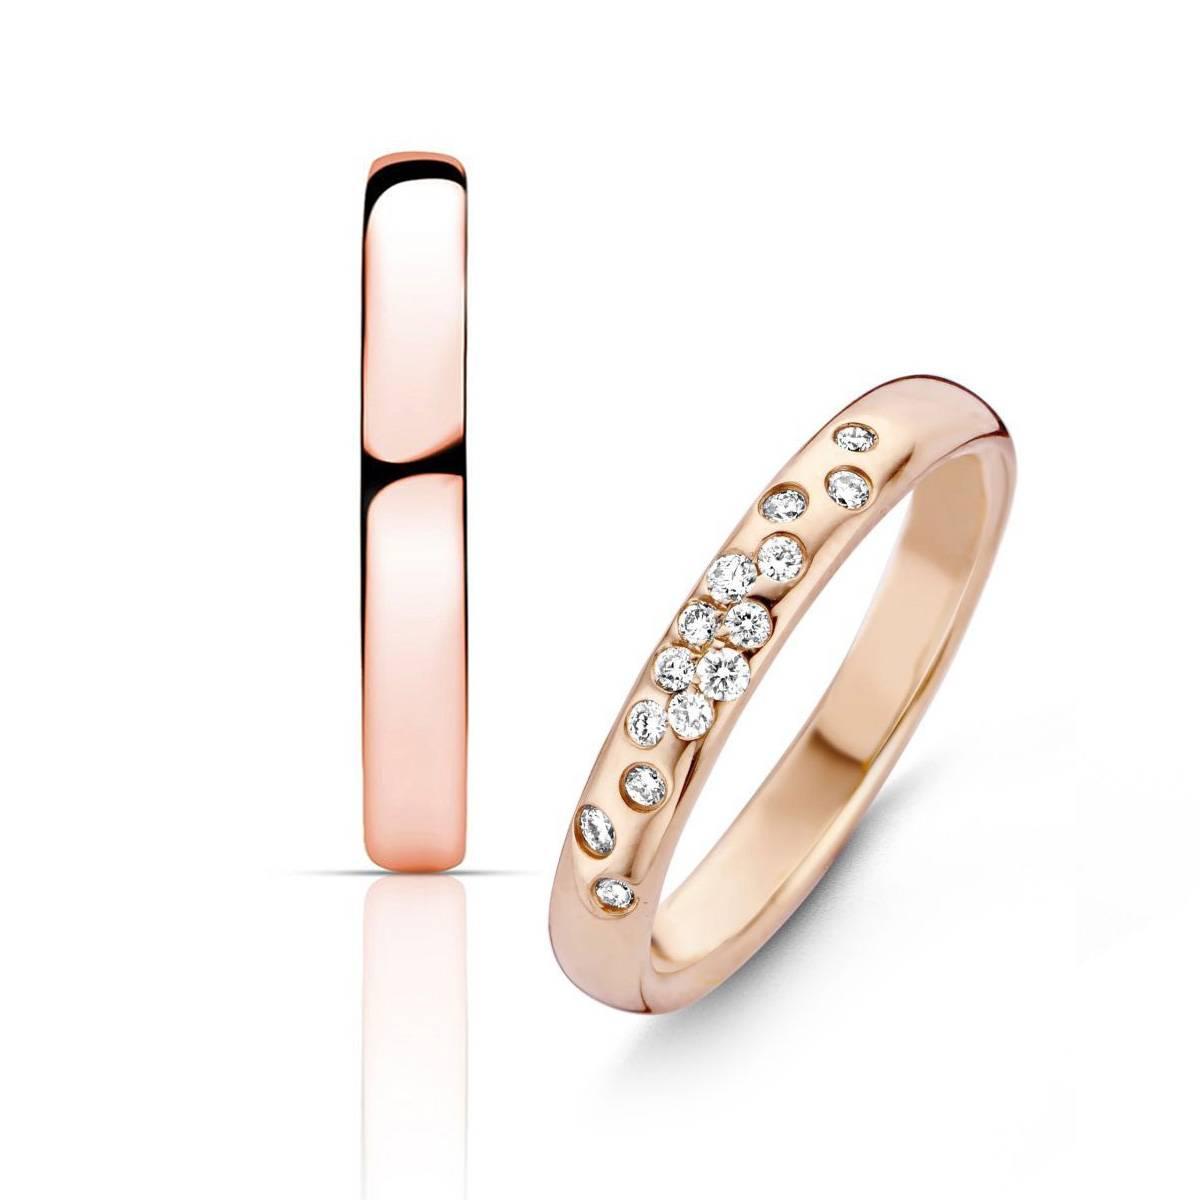 Juwelier Vandromme - Juwelen - Trouwring - Verlovingsring – House of Weddings - 5